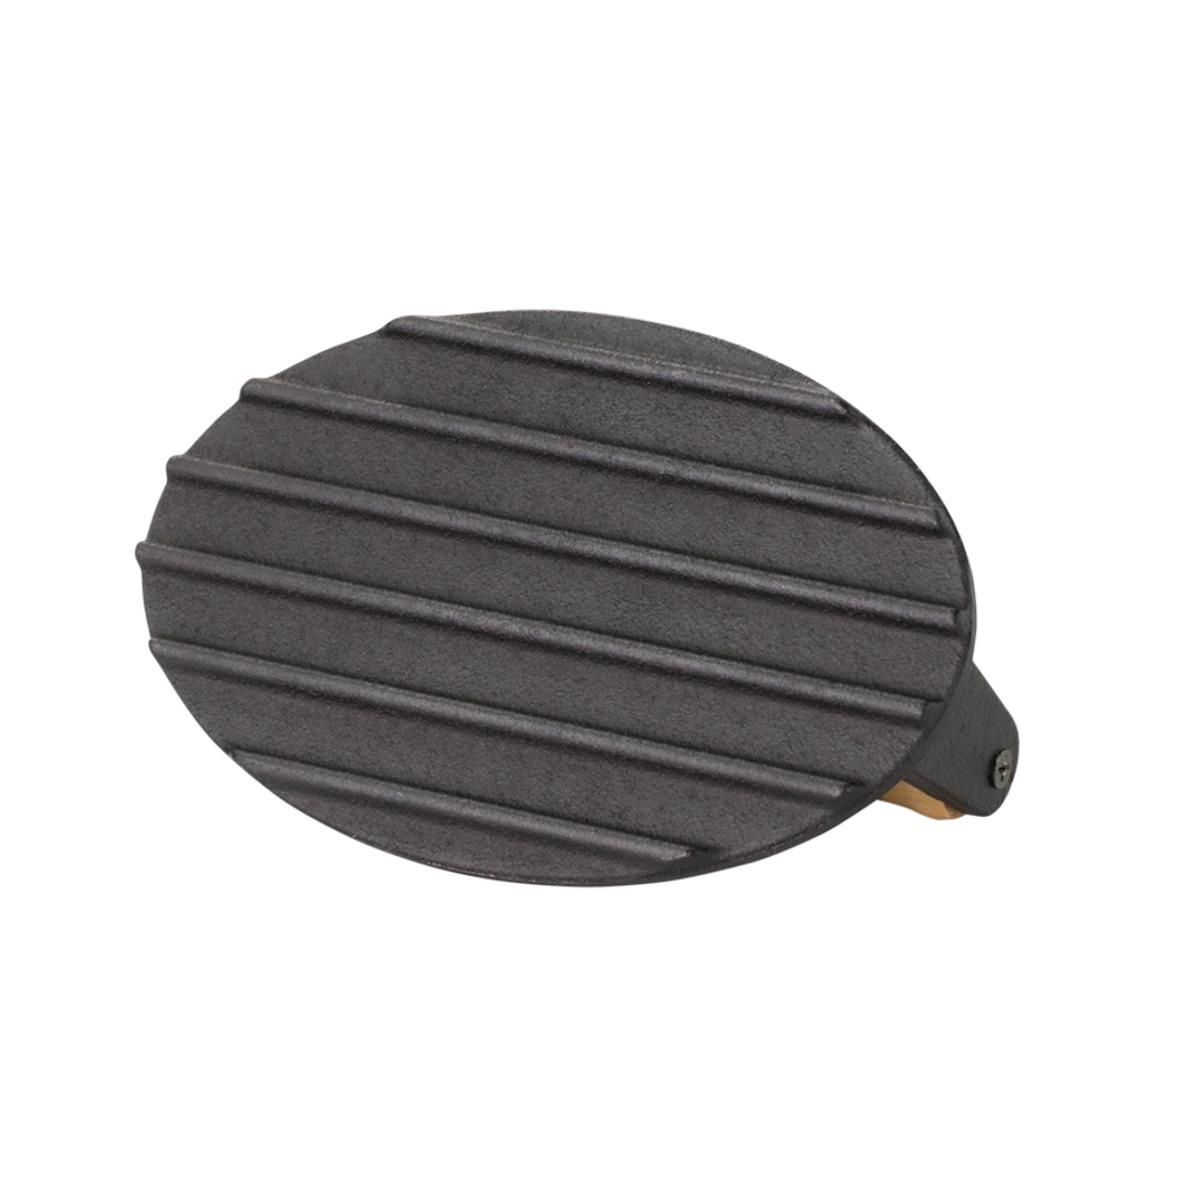 Prensador De Bife Ferro Fundido Santana 18x11cm  - Panela de Ferro Fundido